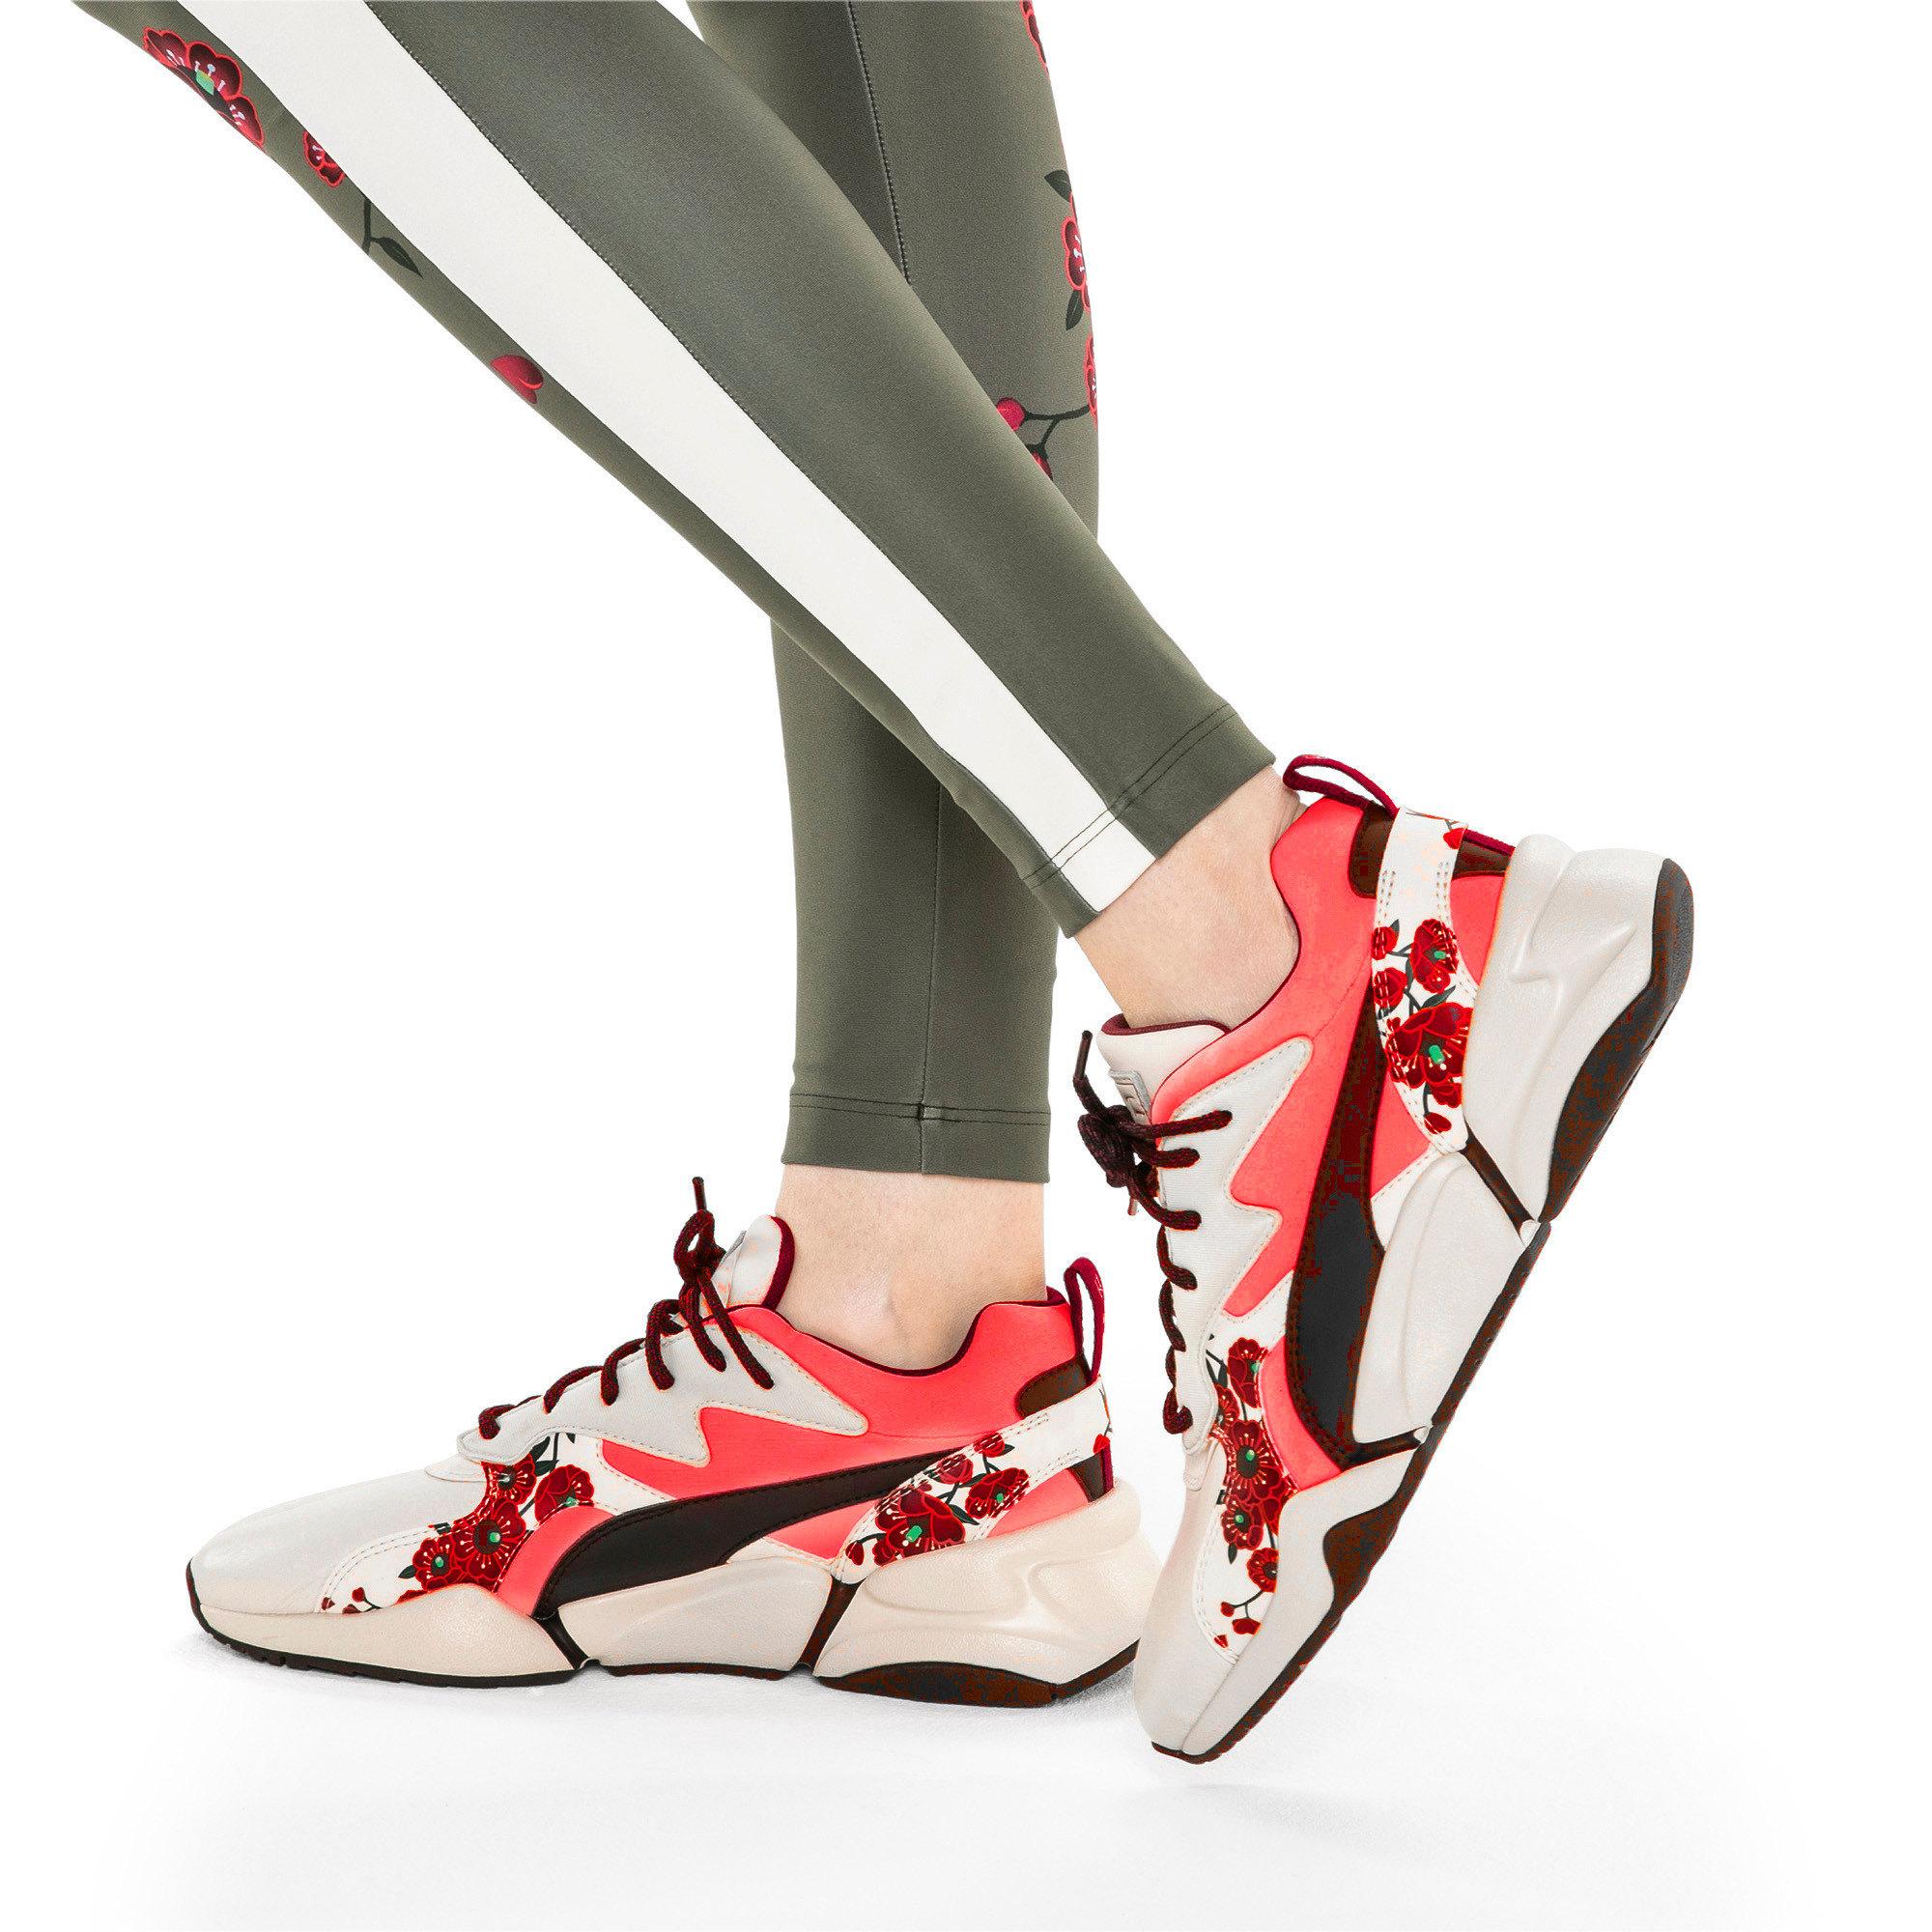 Thumbnail 2 of PUMA x SUE TSAI Nova Cherry Bombs sneakers voor dames, Powder Puff-Puma Black, medium